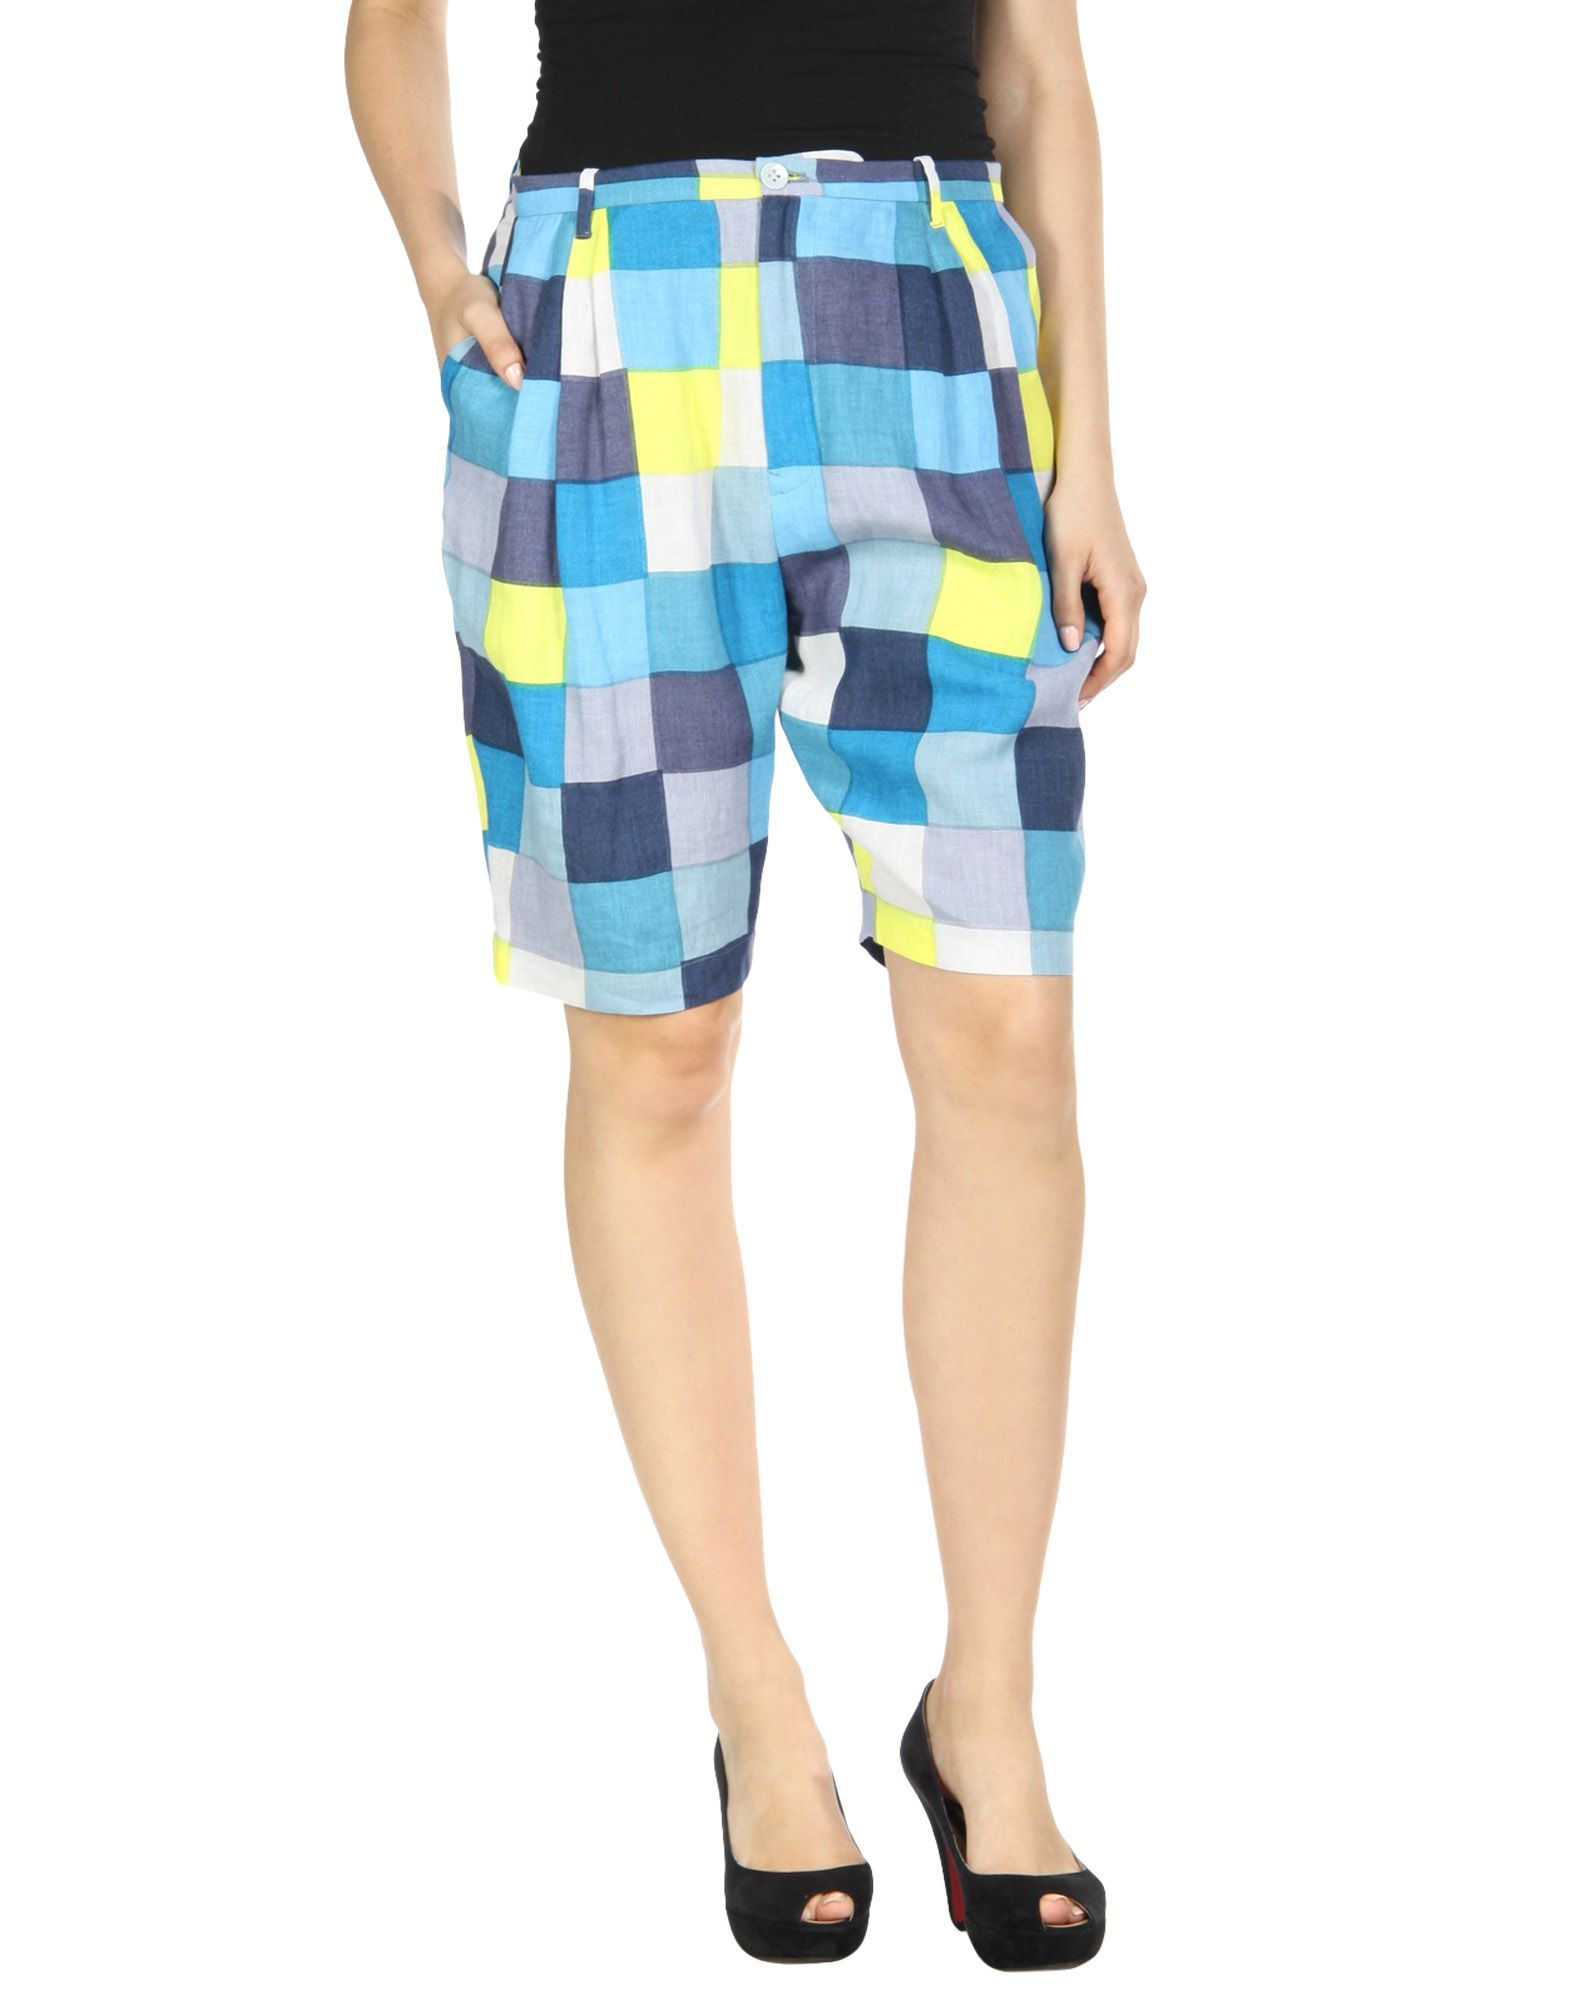 MINÄ PERHONEN Shorts & Bermuda in Blue